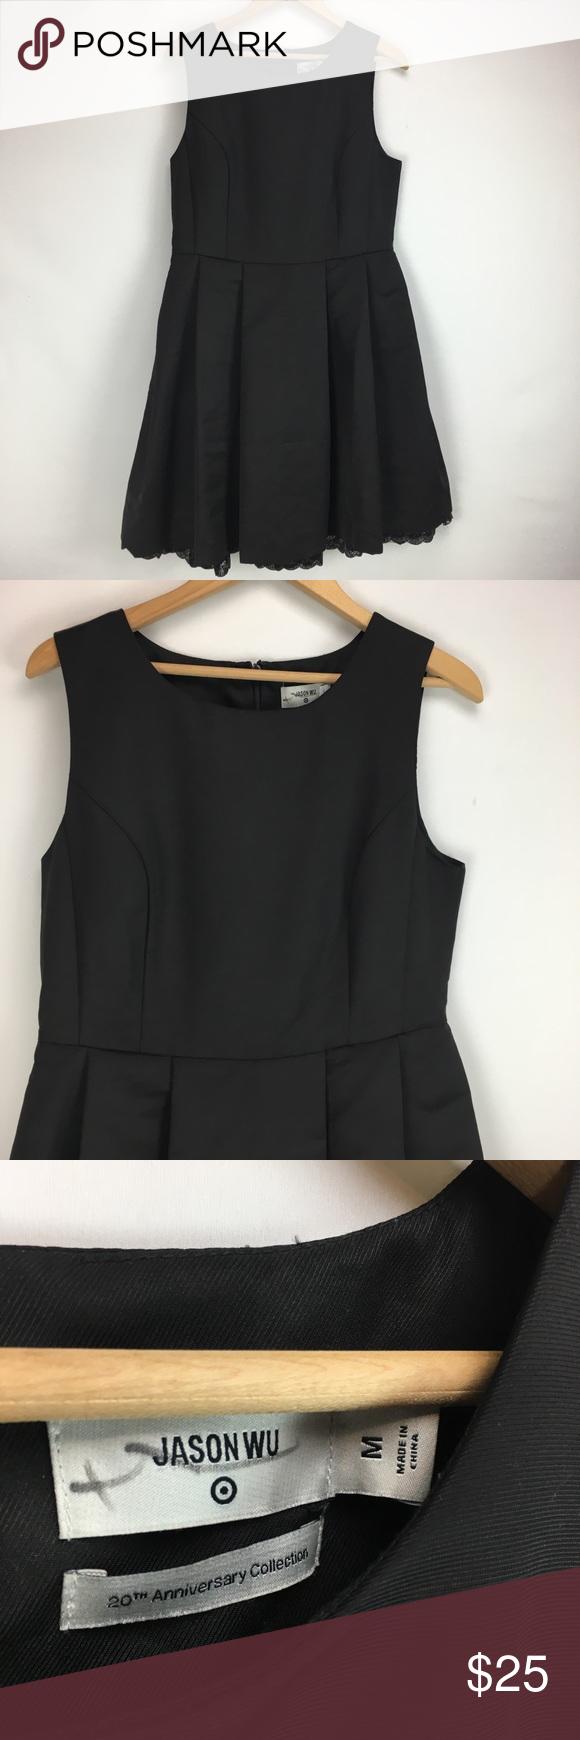 Jason Wu Target Dress Mshift Black Sleeveless Target Dresses Sleeveless Black Sleeveless Dress [ 1740 x 580 Pixel ]